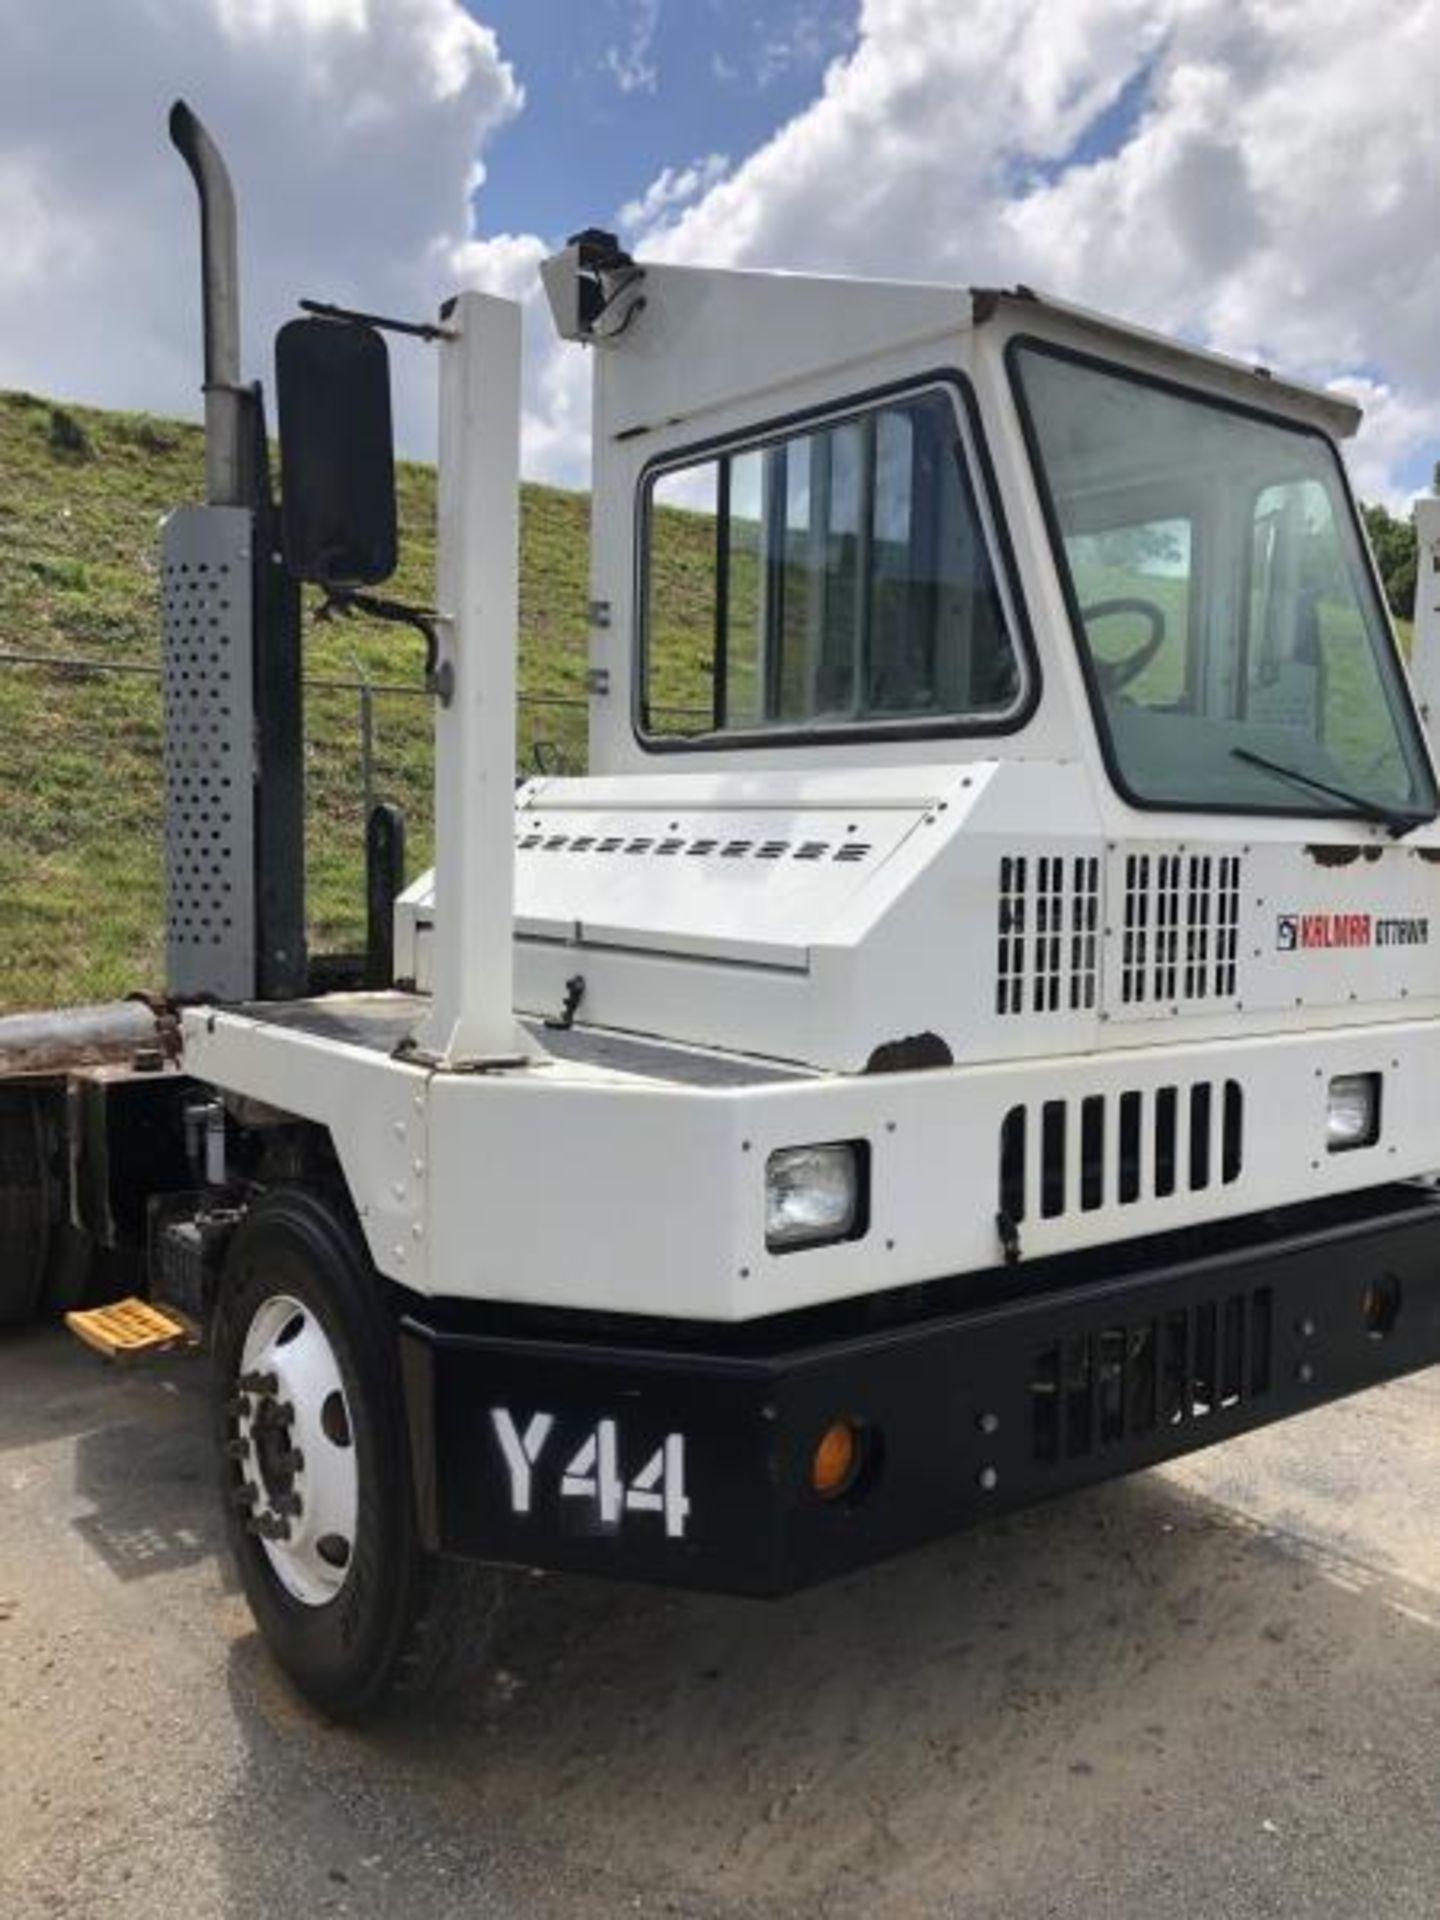 2015 Kalmar Ottawa 4x2 Yard Truck , SN: 338838 3,710.3 Hours, 2,817 Miles